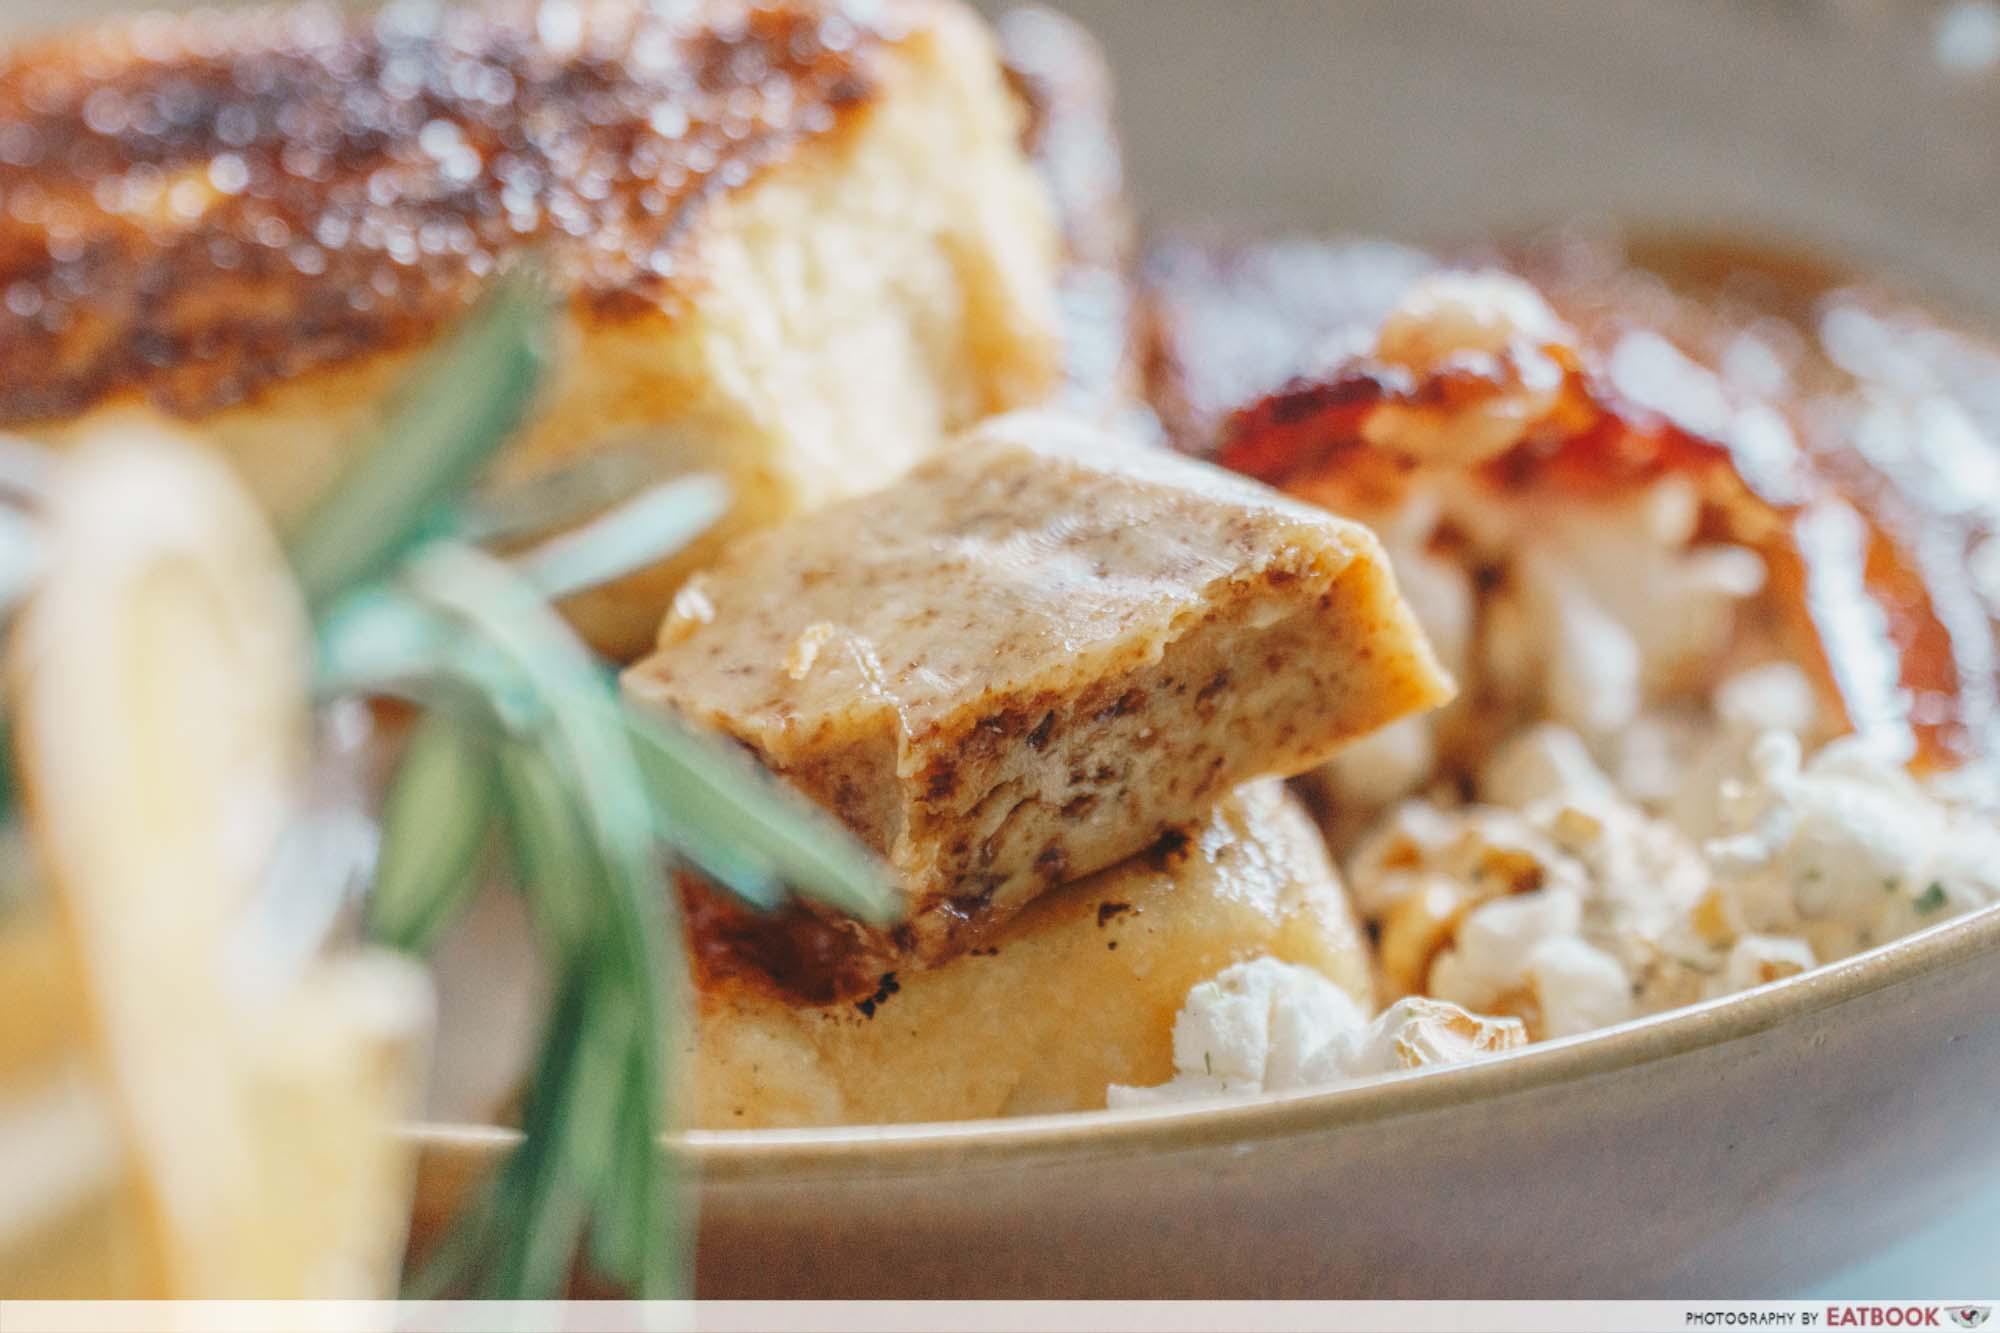 Tropique Cafe & Restaurant - Honeycomb Butter